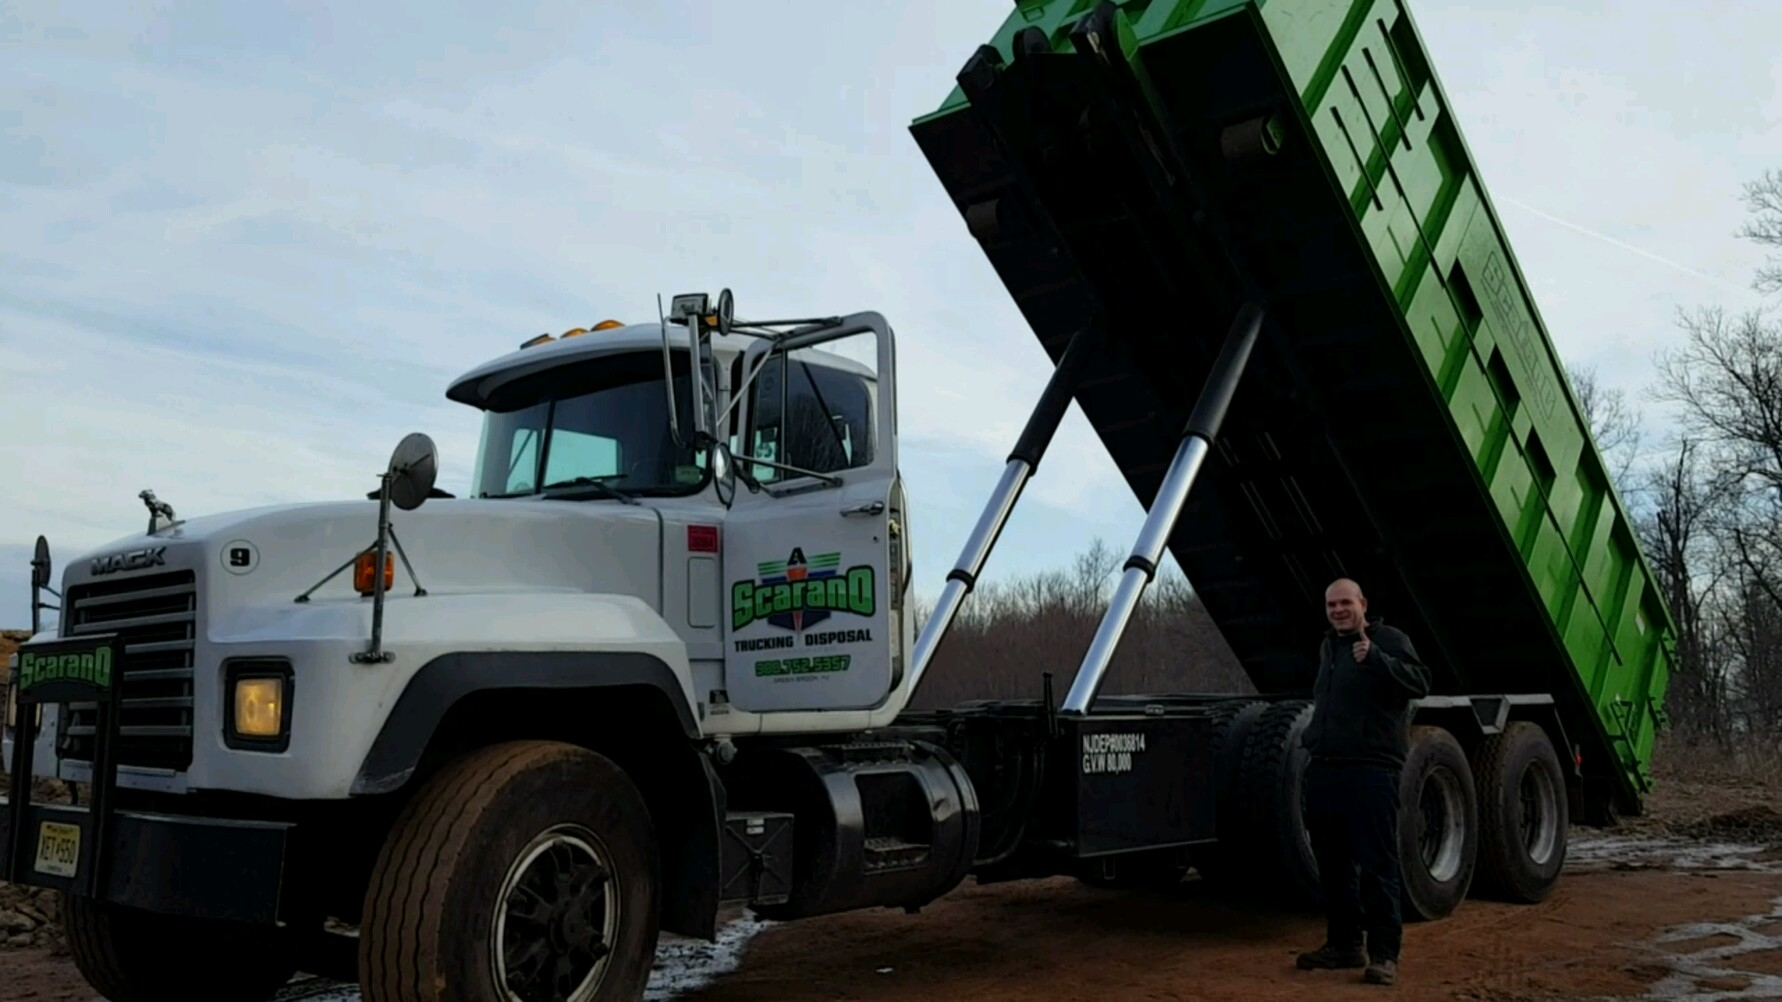 8 Yard Dumpster Waste Management